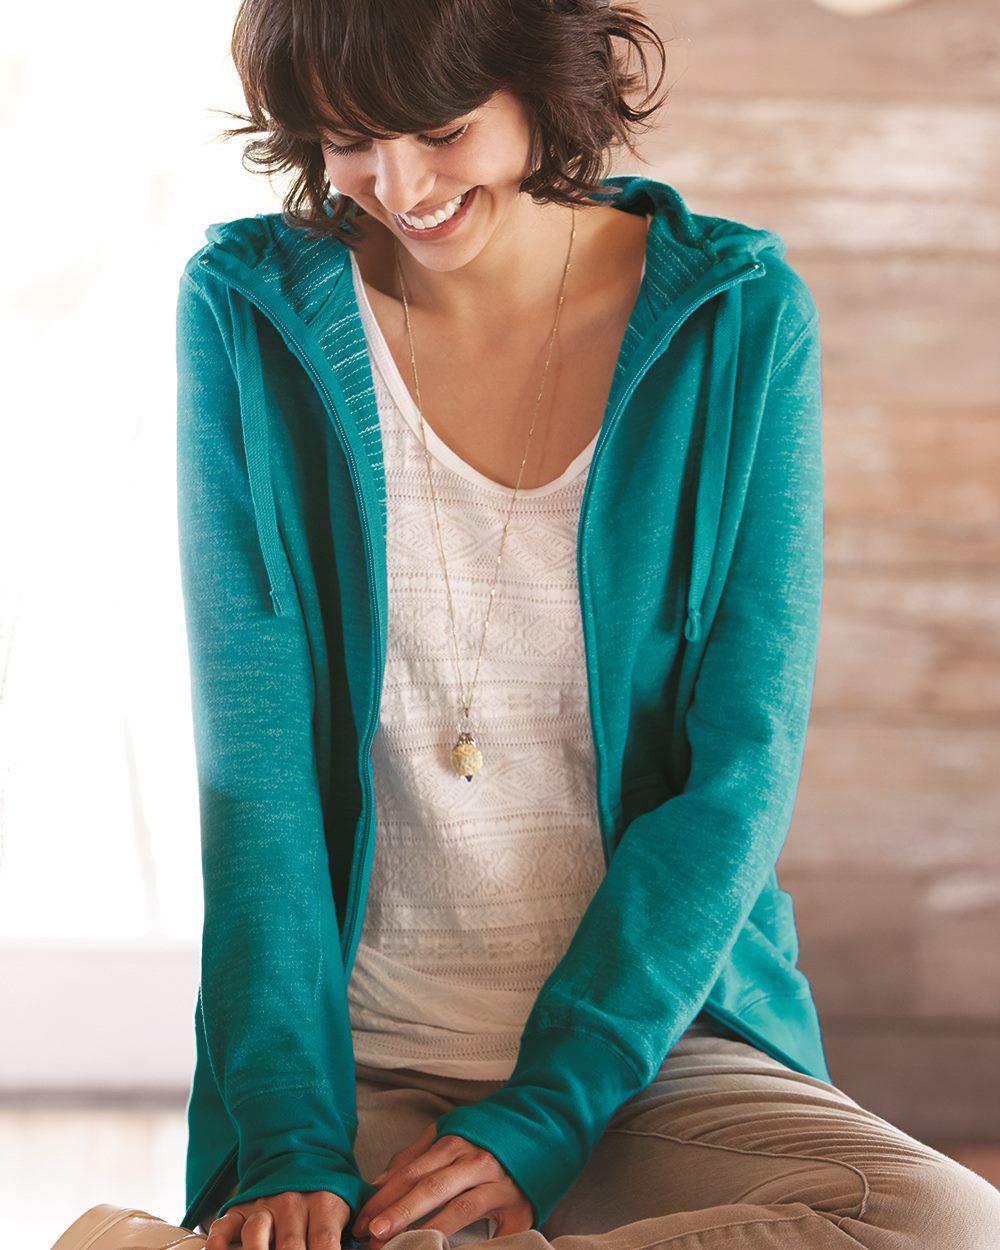 Independent Trading Co. PRM655BZ 女士条纹薄款连帽拉链外套